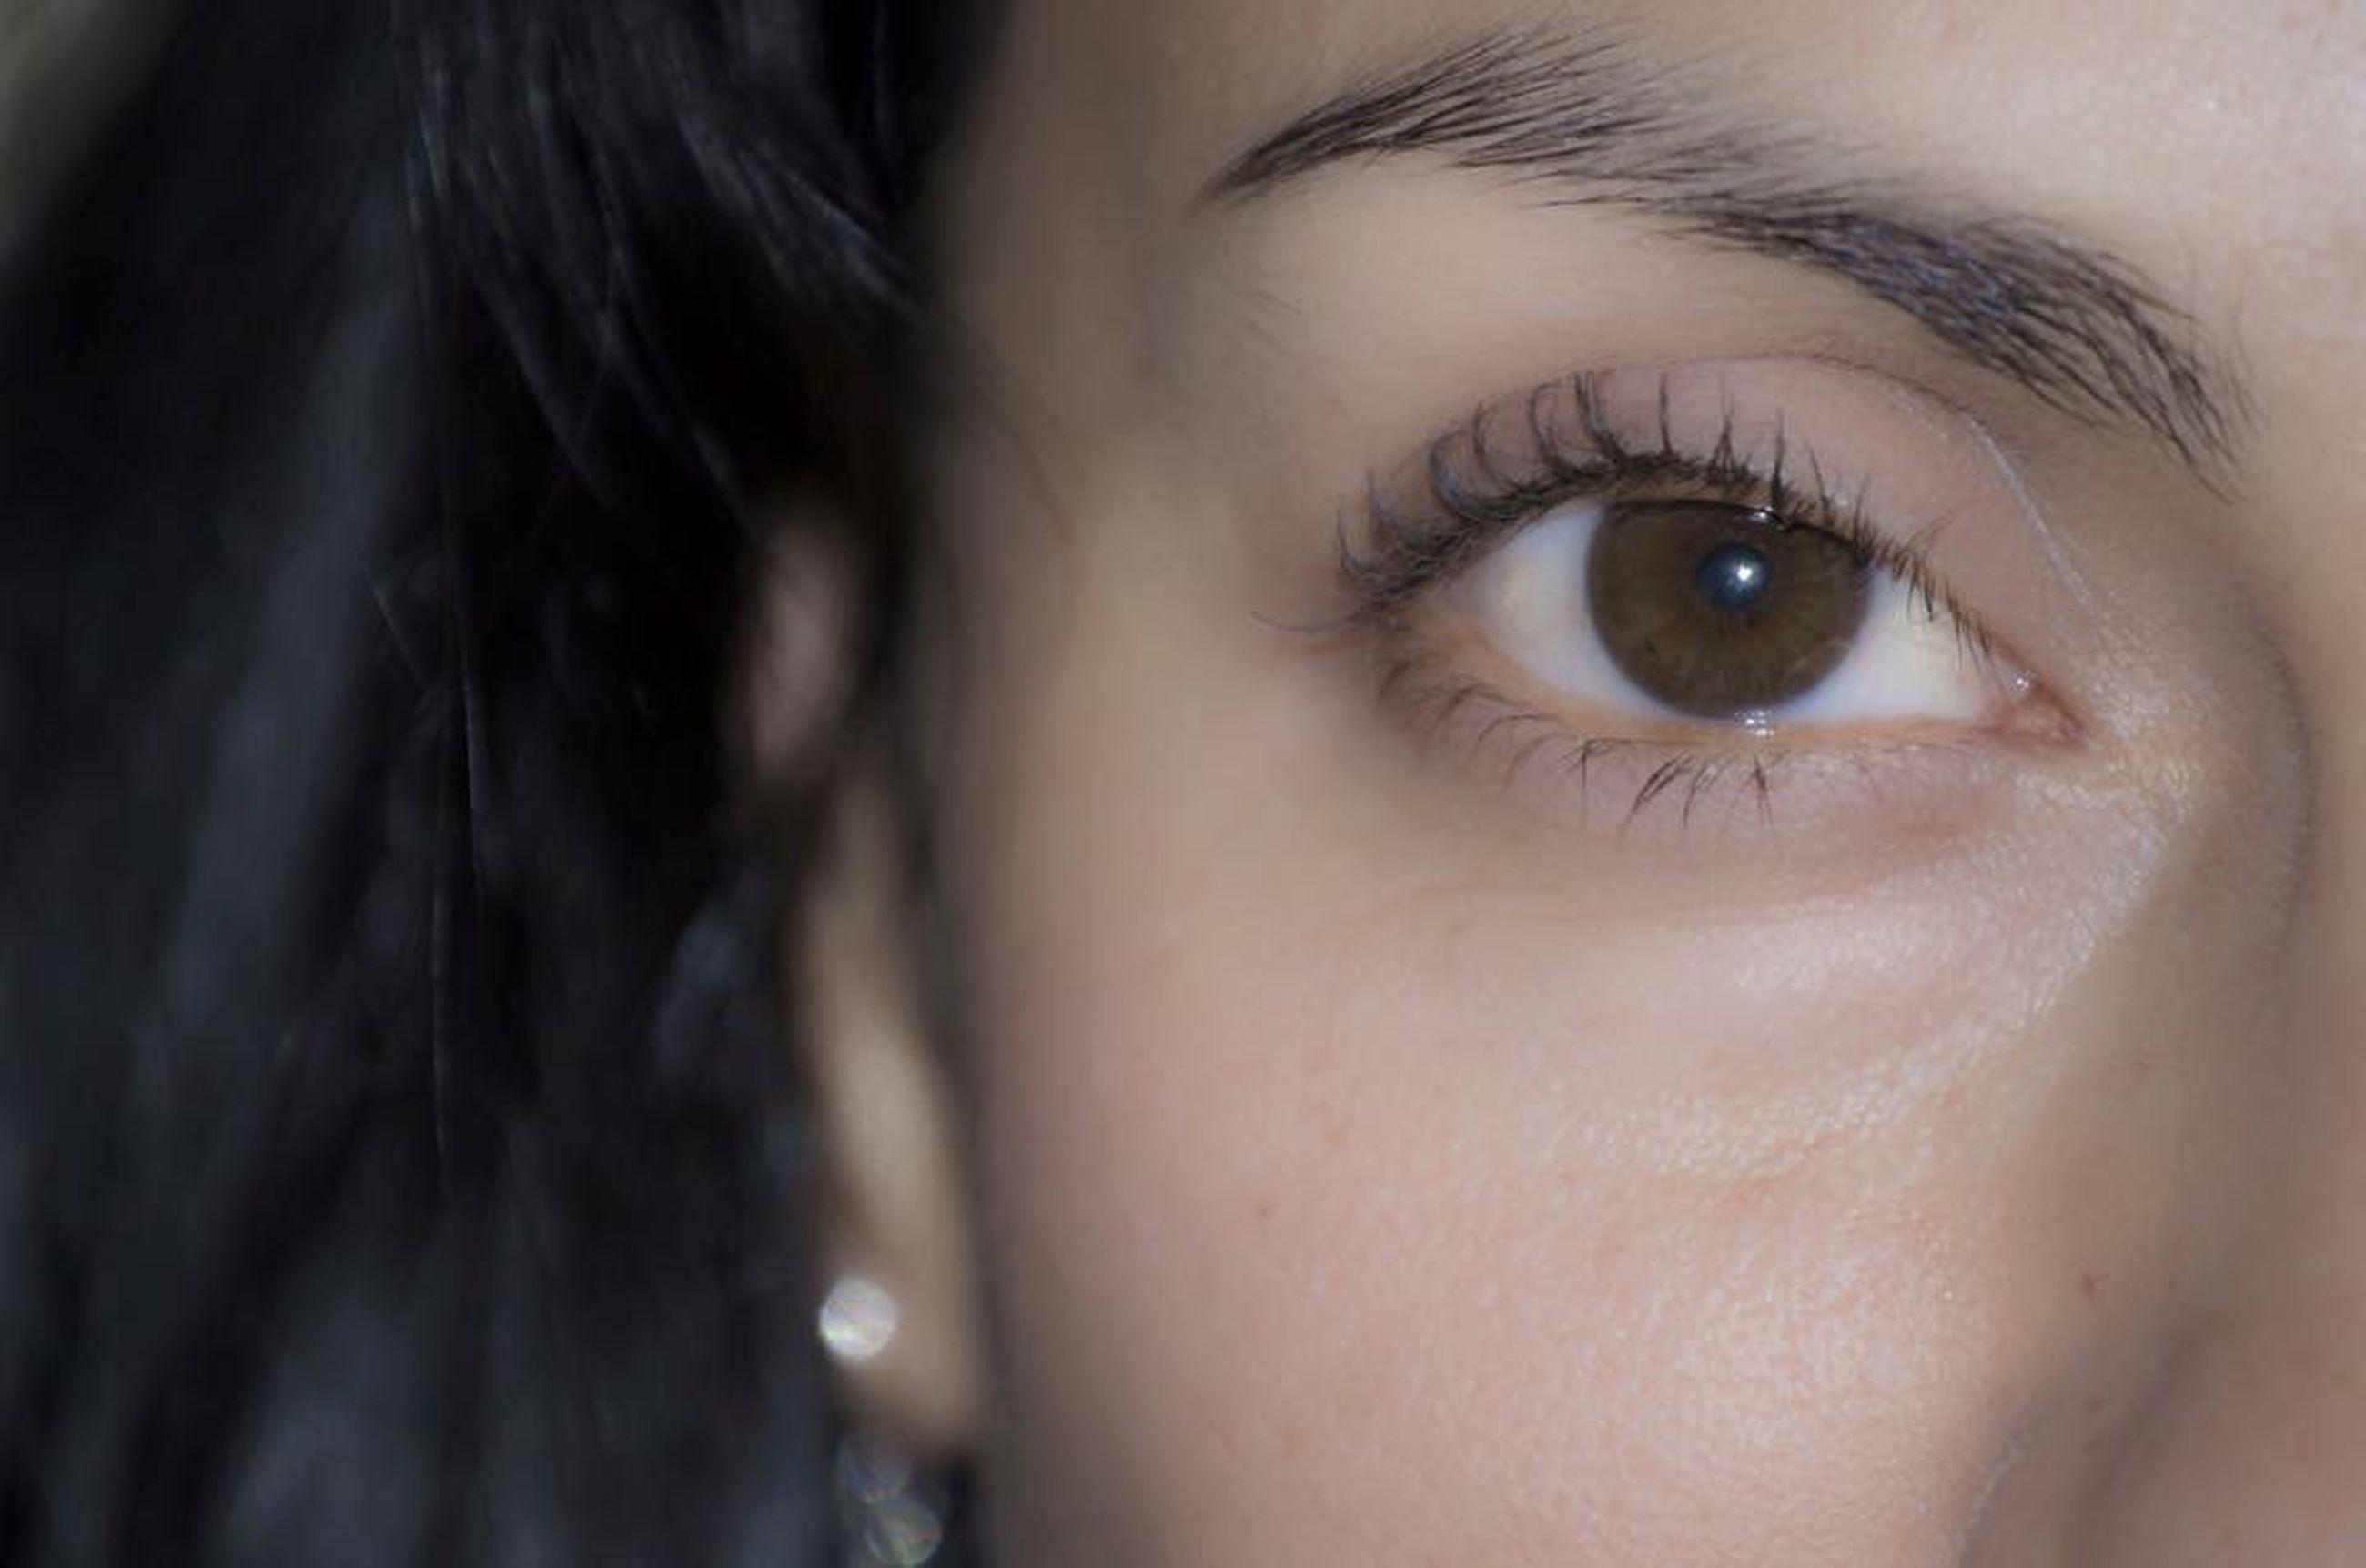 close-up, human eye, headshot, human face, looking at camera, lifestyles, portrait, eyelash, young adult, person, indoors, young women, part of, human skin, eyesight